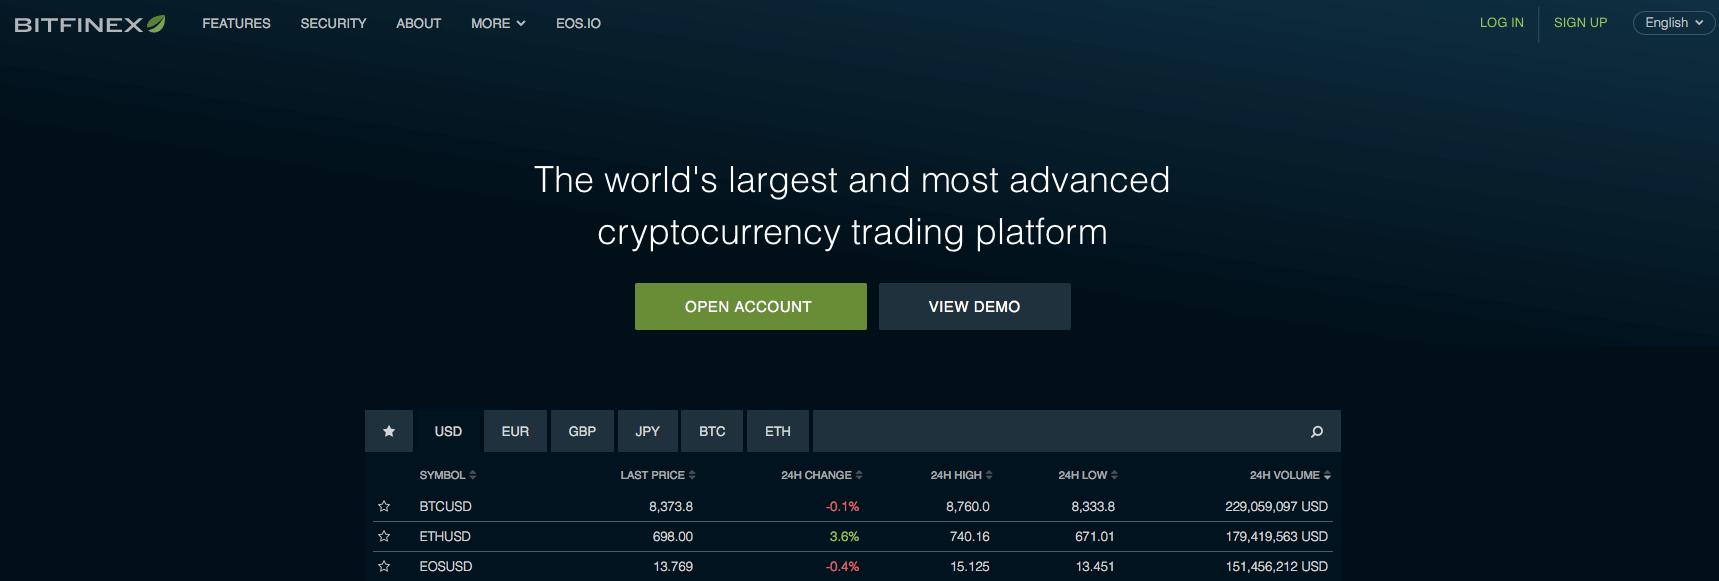 Bitfinexの公式ページ